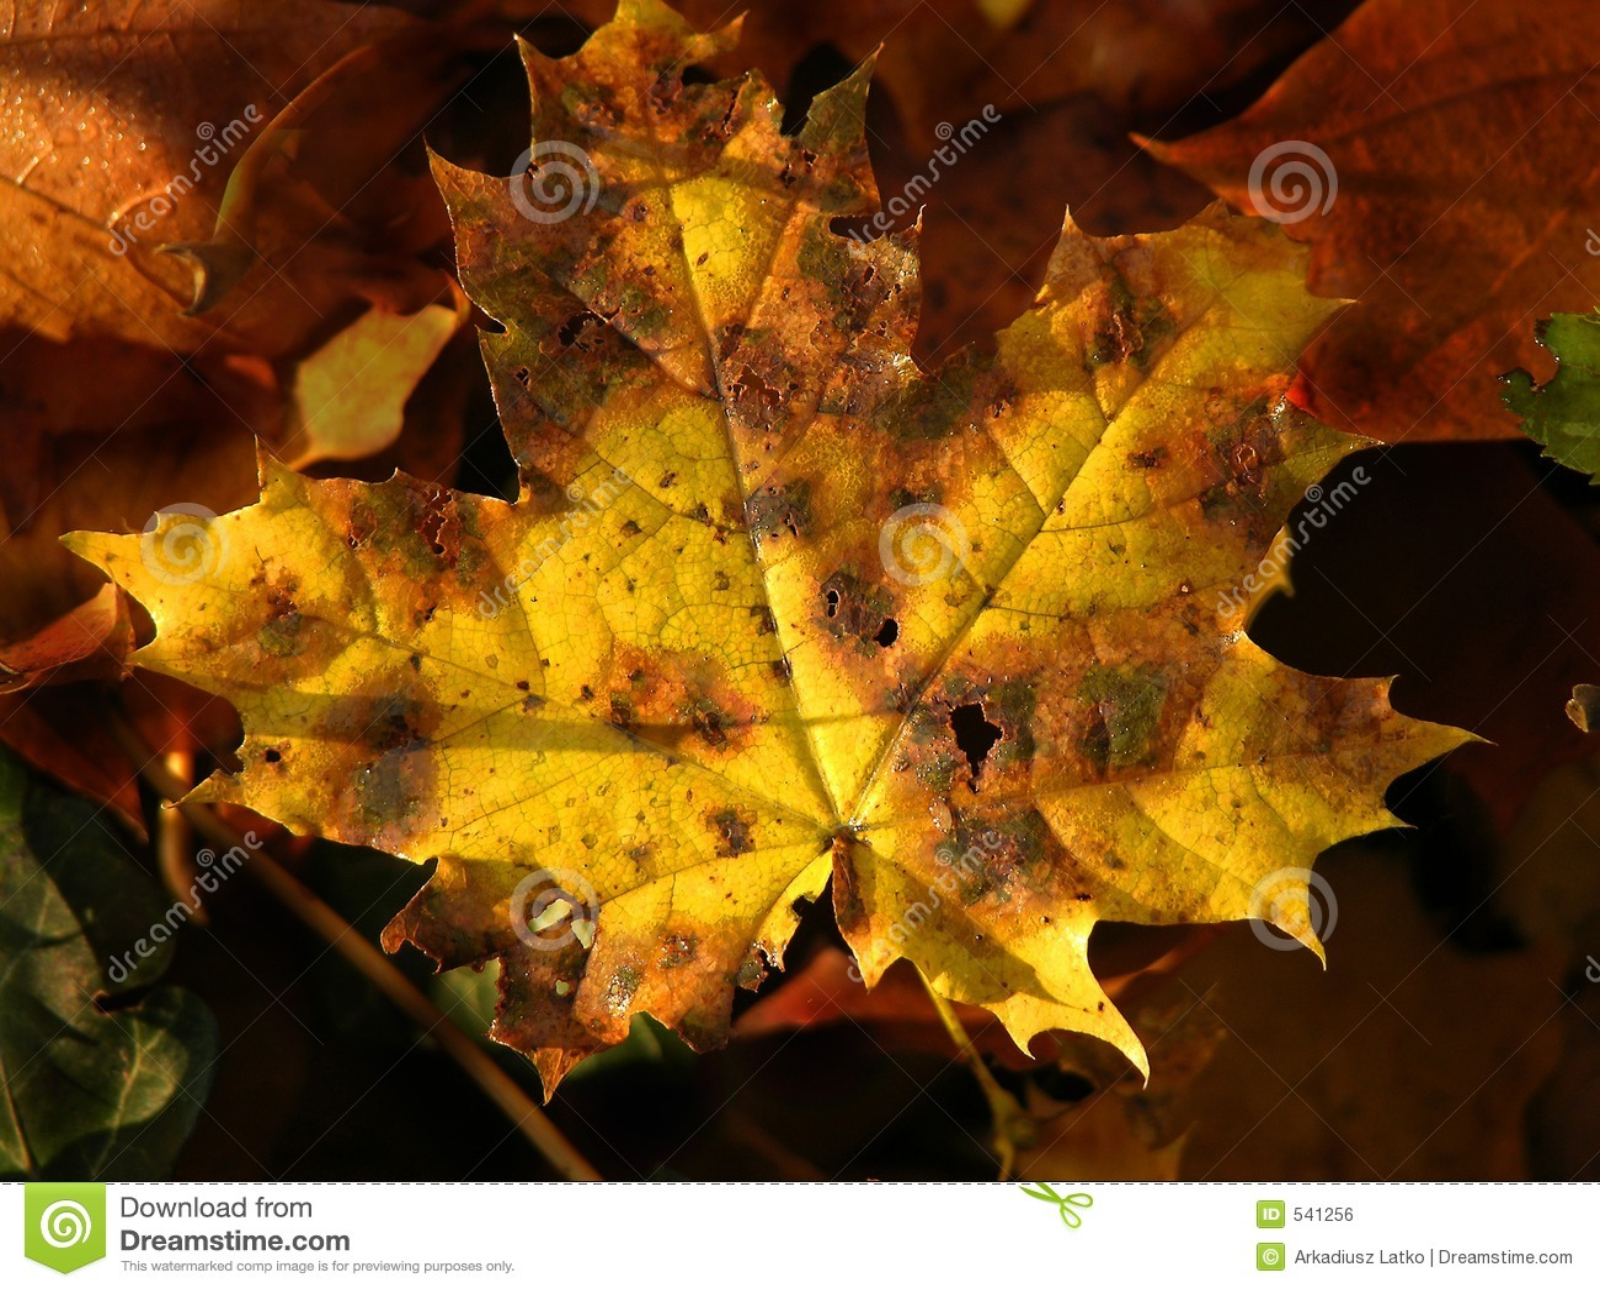 Download 秋叶黄色 库存照片. 图片 包括有 秋天, 红色, 结构树, 晒裂, 词根, 高级, 增长, 成熟, 本质, 橙色 - 541256